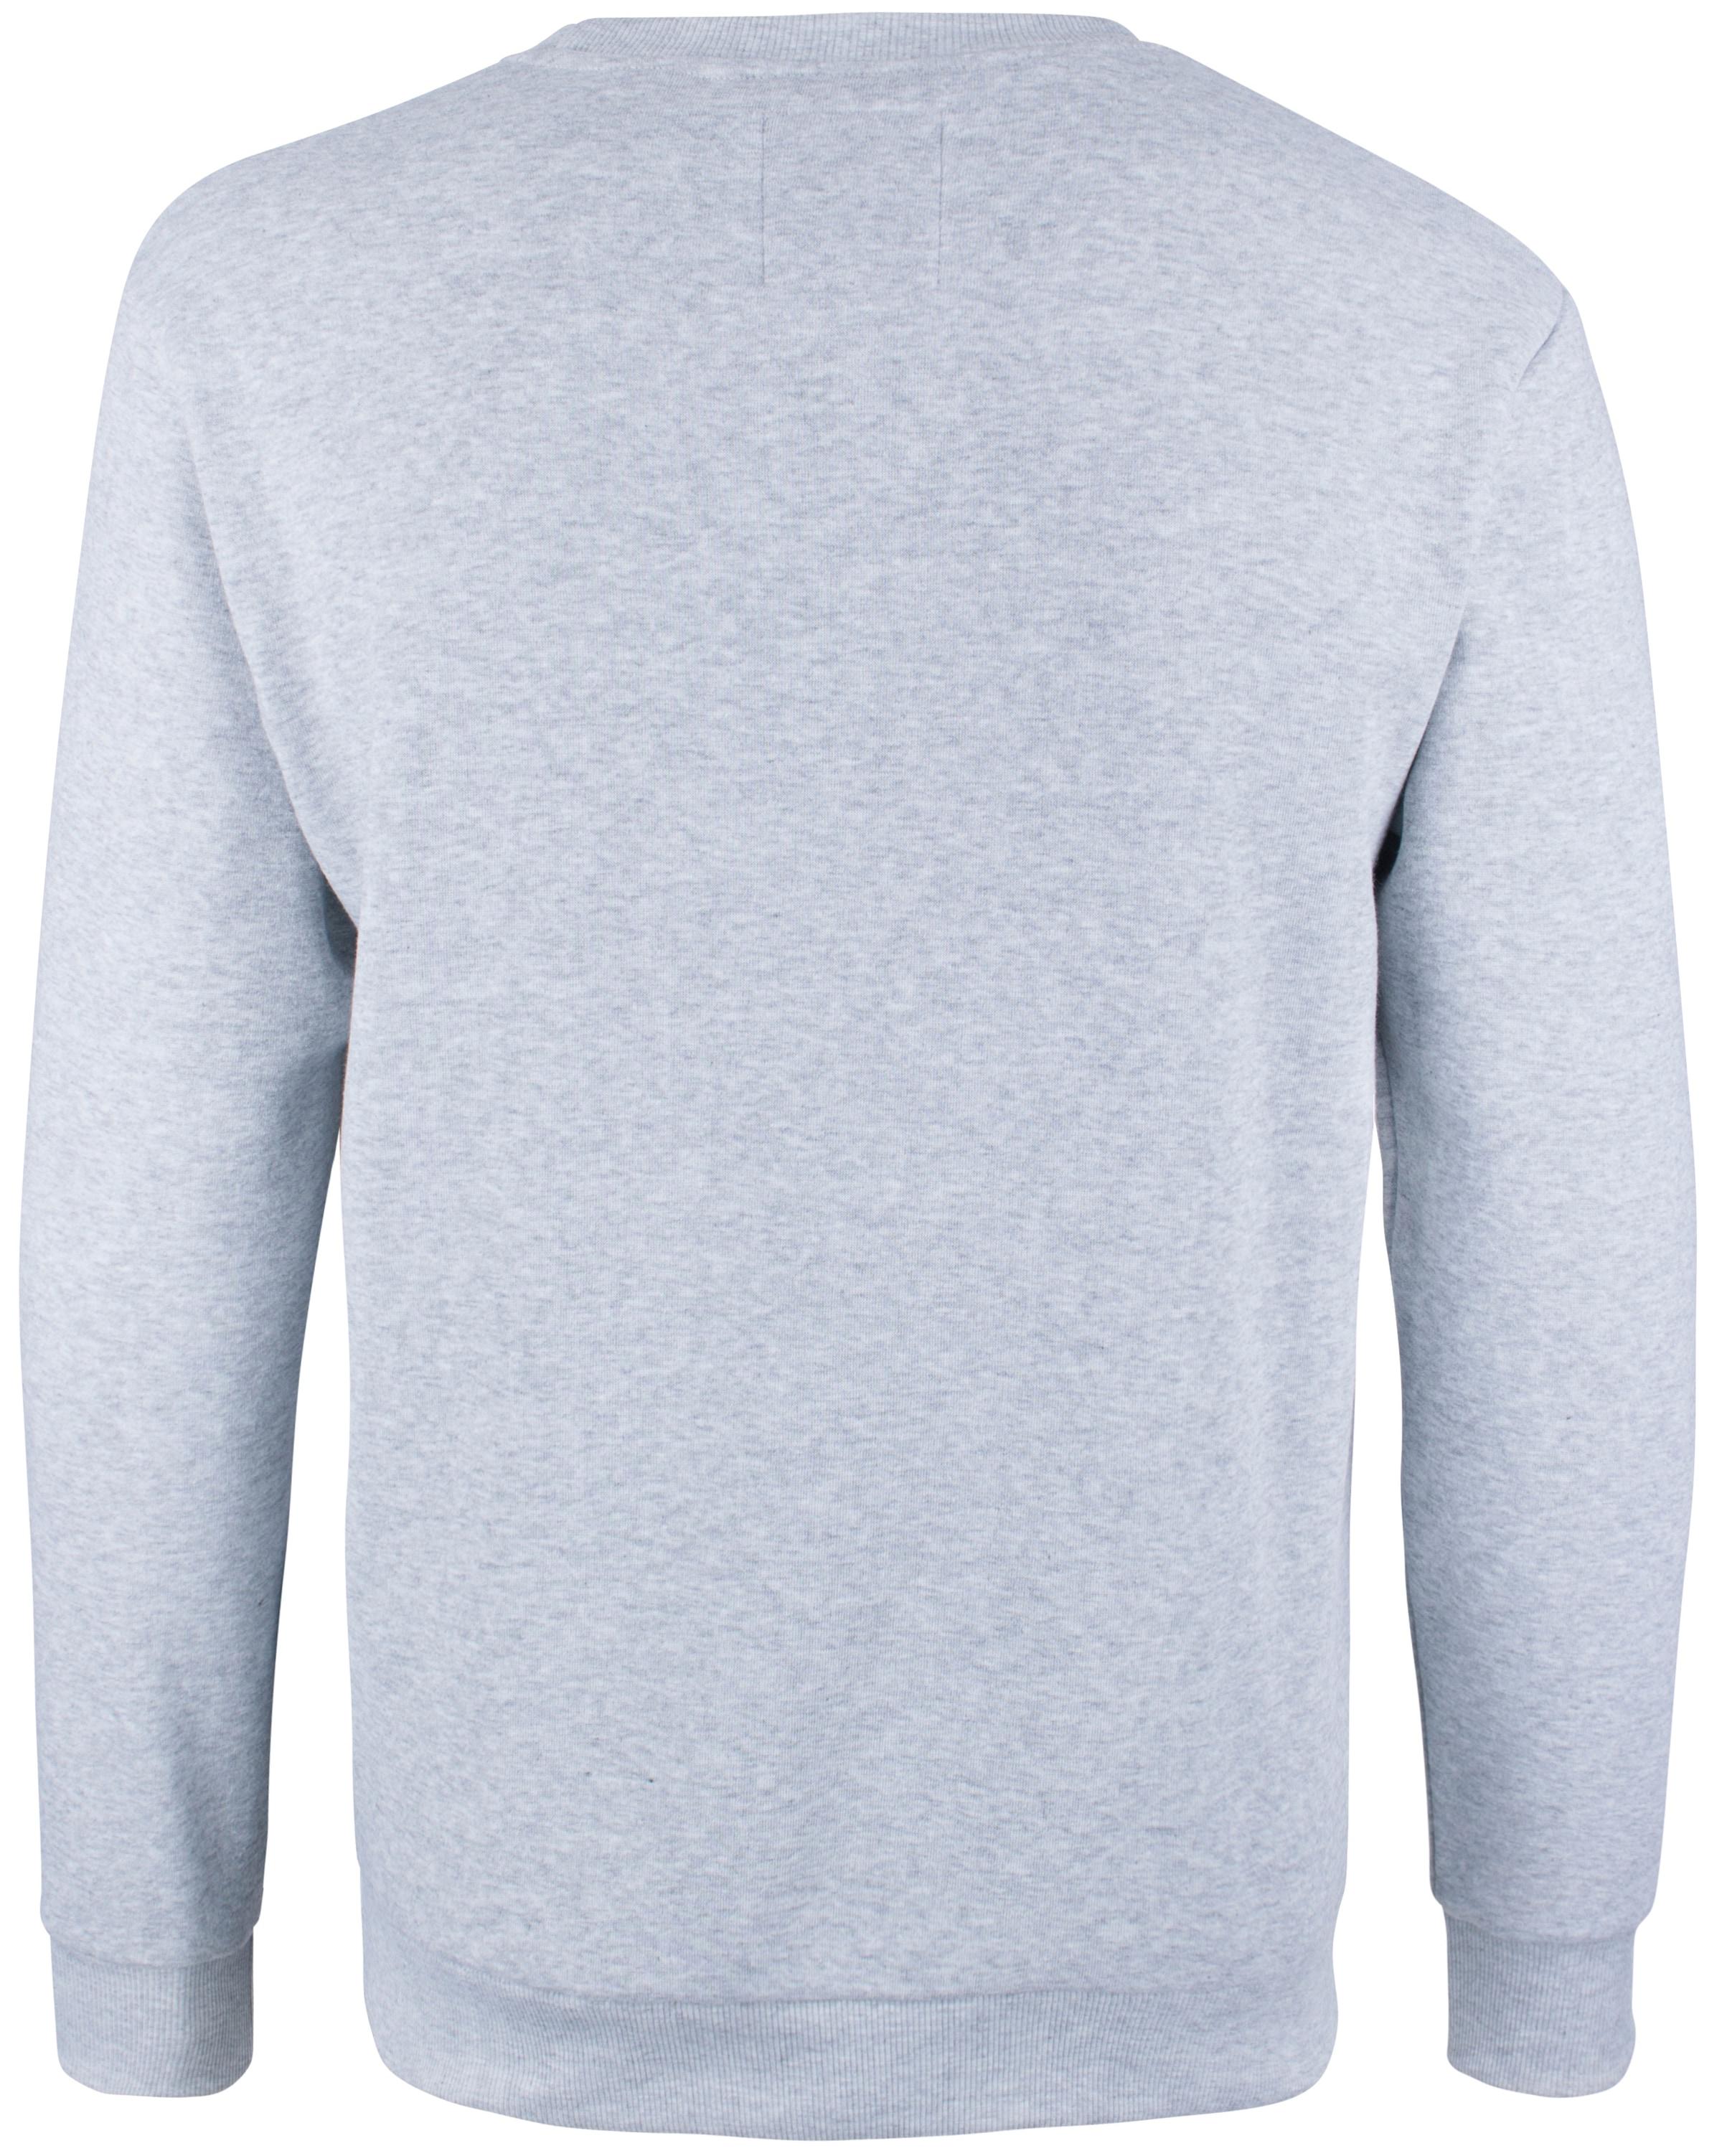 shirt Sweat Soulstar En ChinéNoir Gris wZiTPkOXu